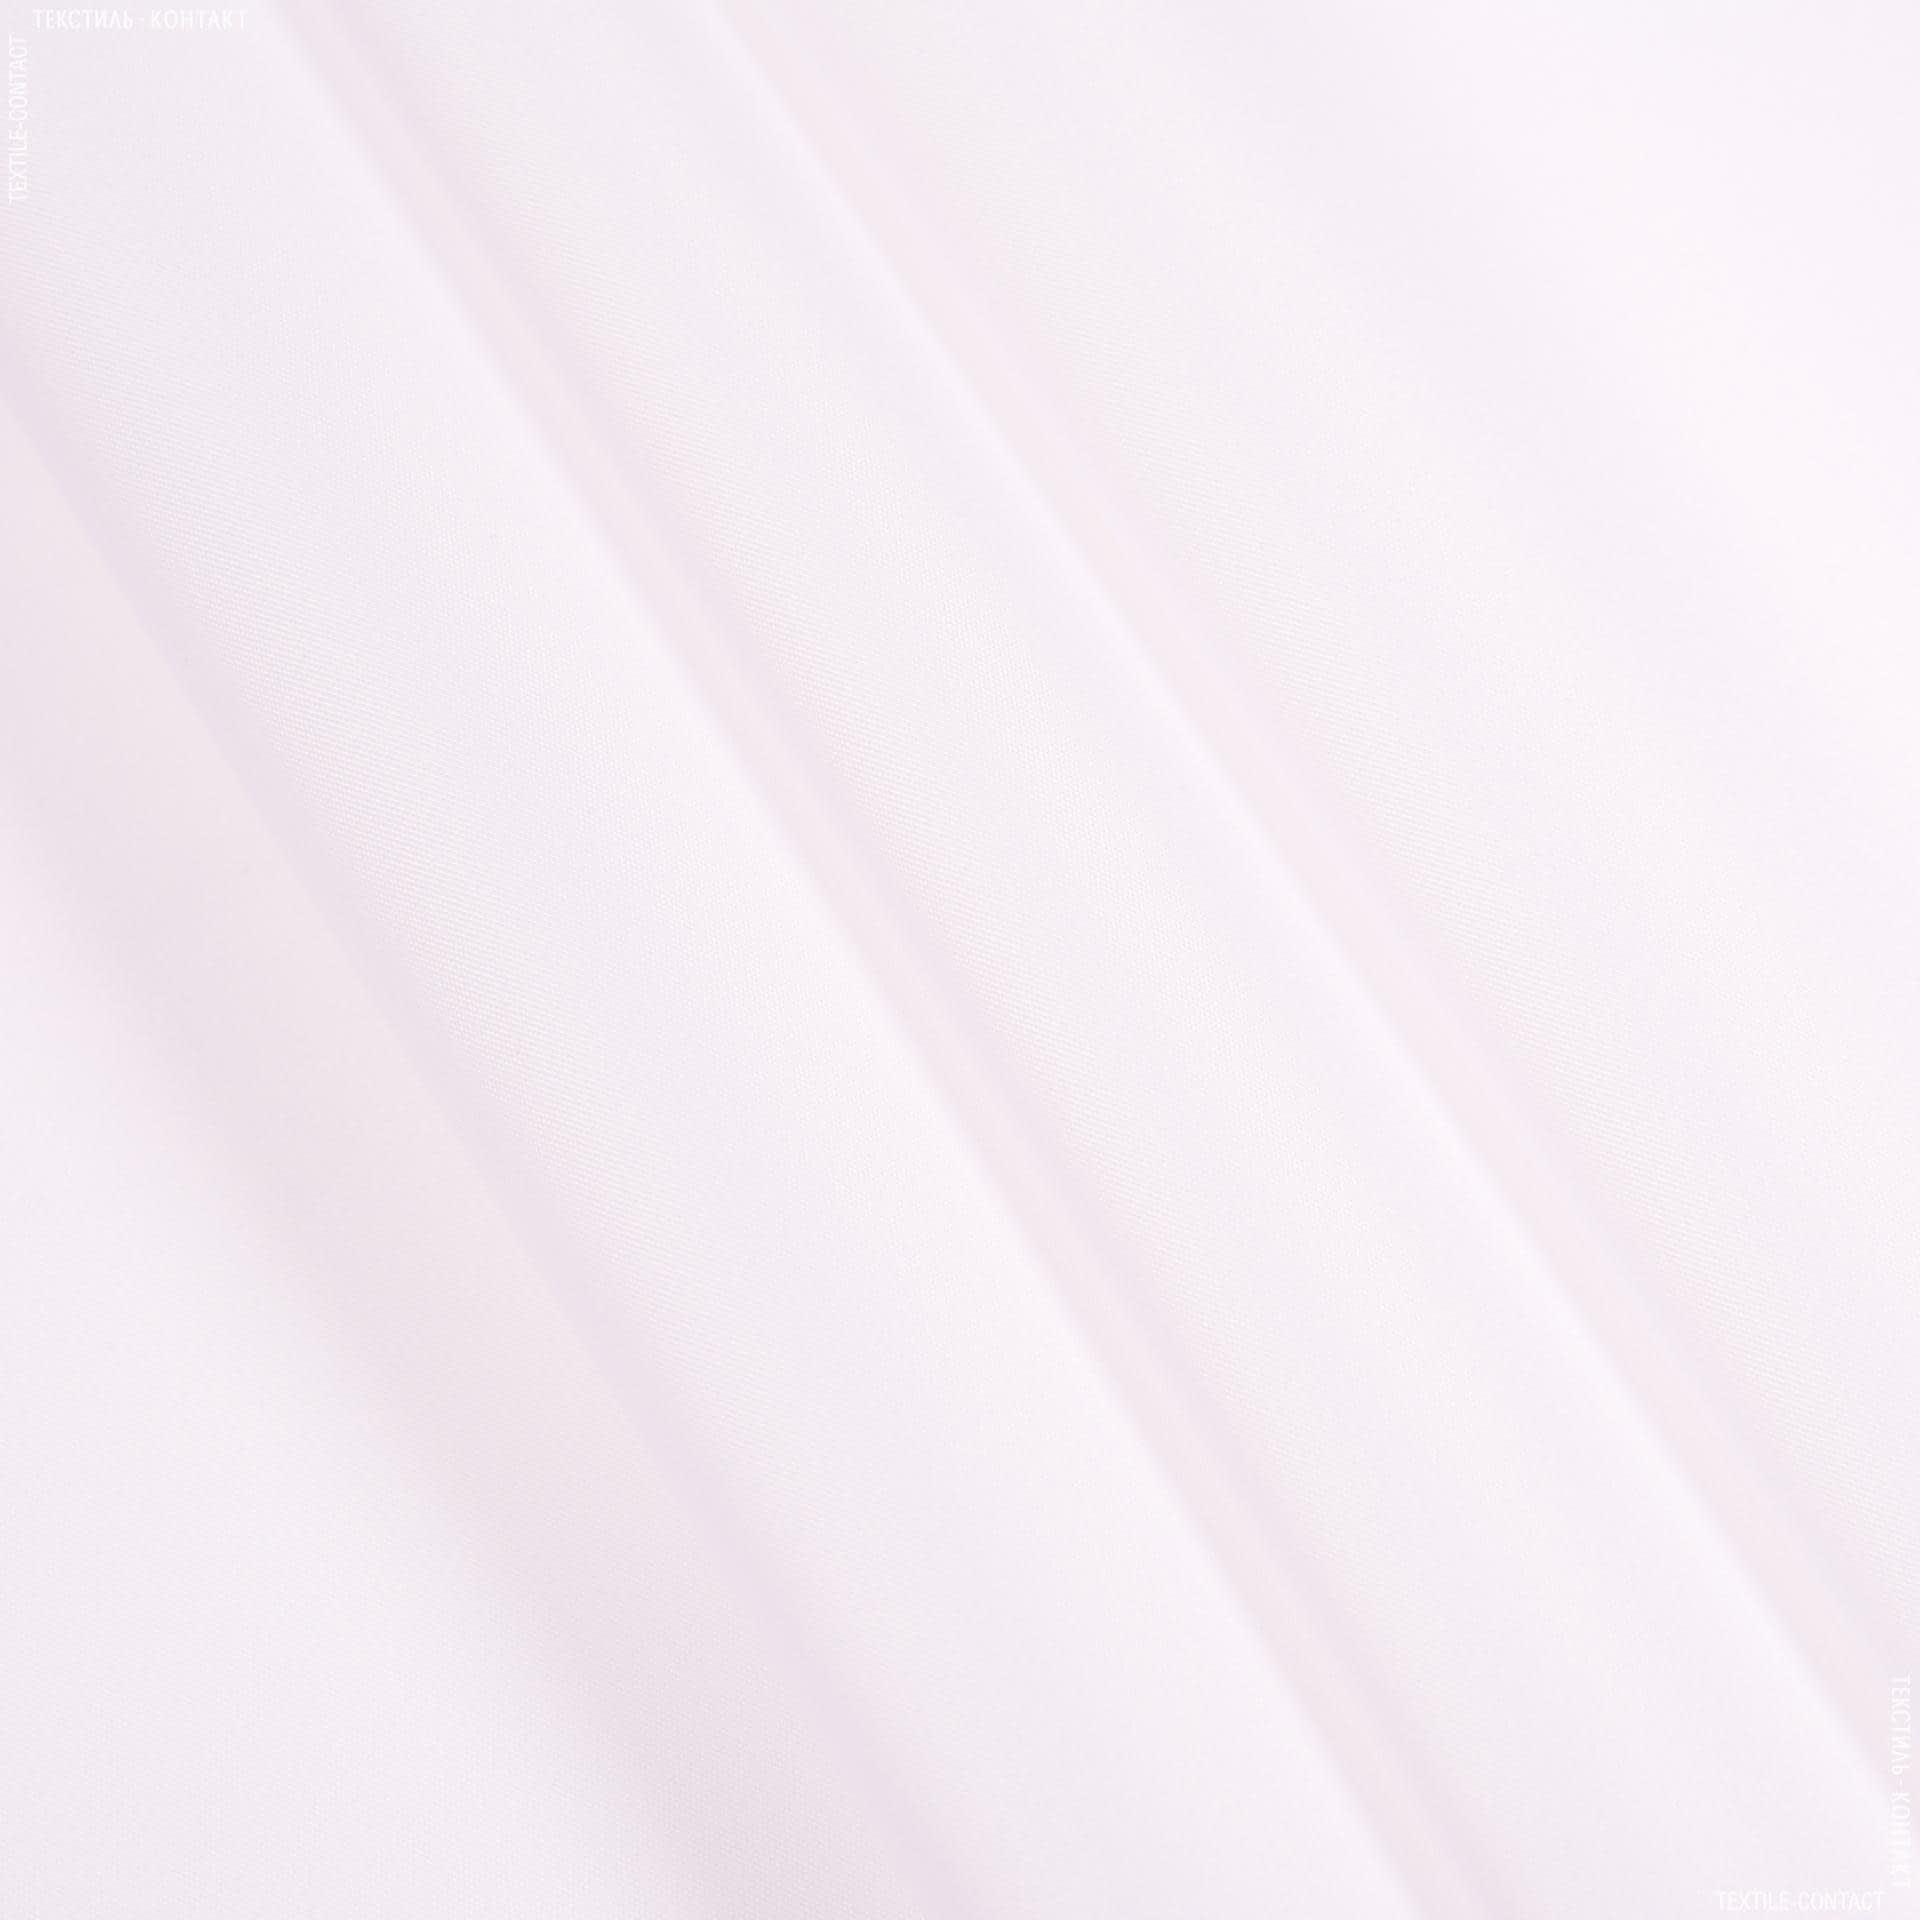 Ткани для палаток - Ода курточная белый